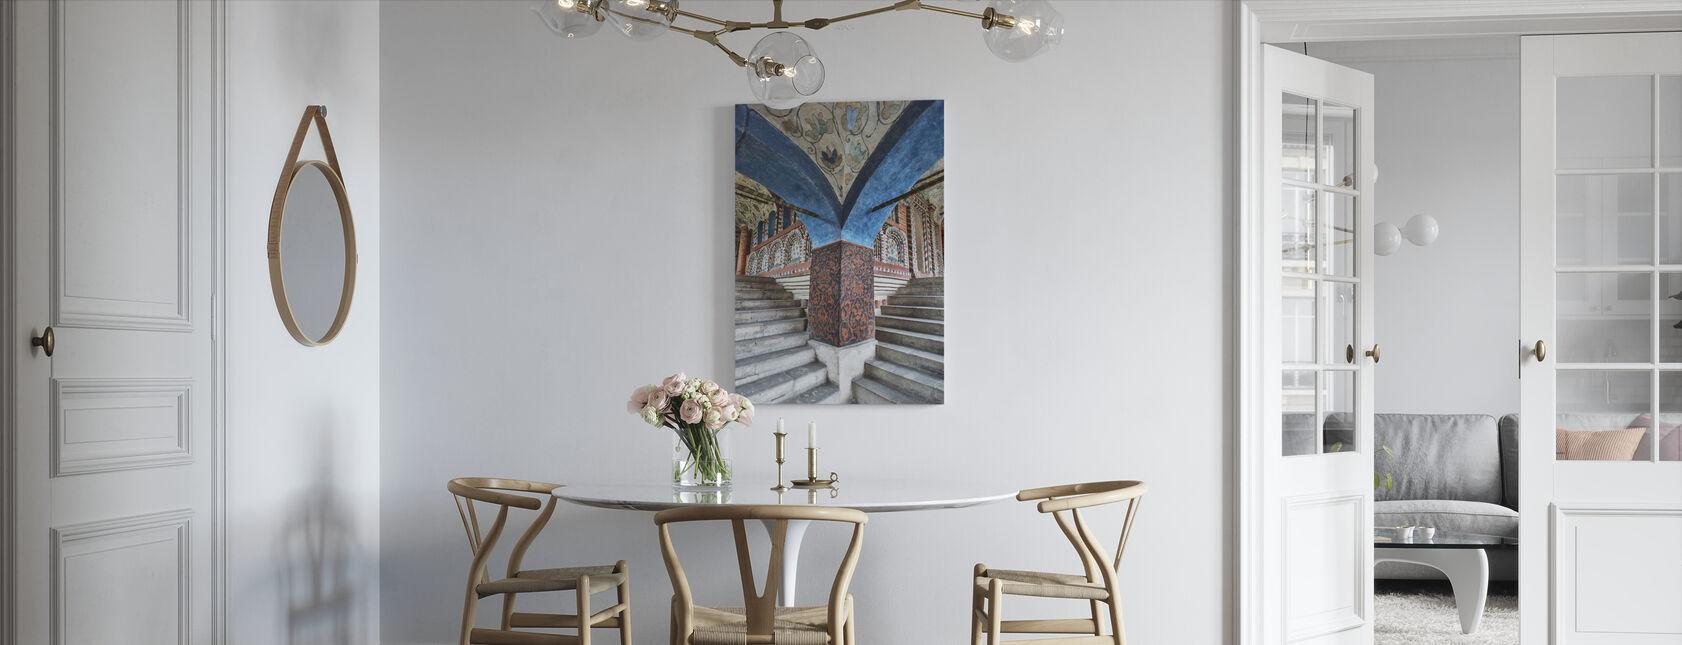 Steps inside Saint Basil's Cathedral - Canvas print - Kitchen